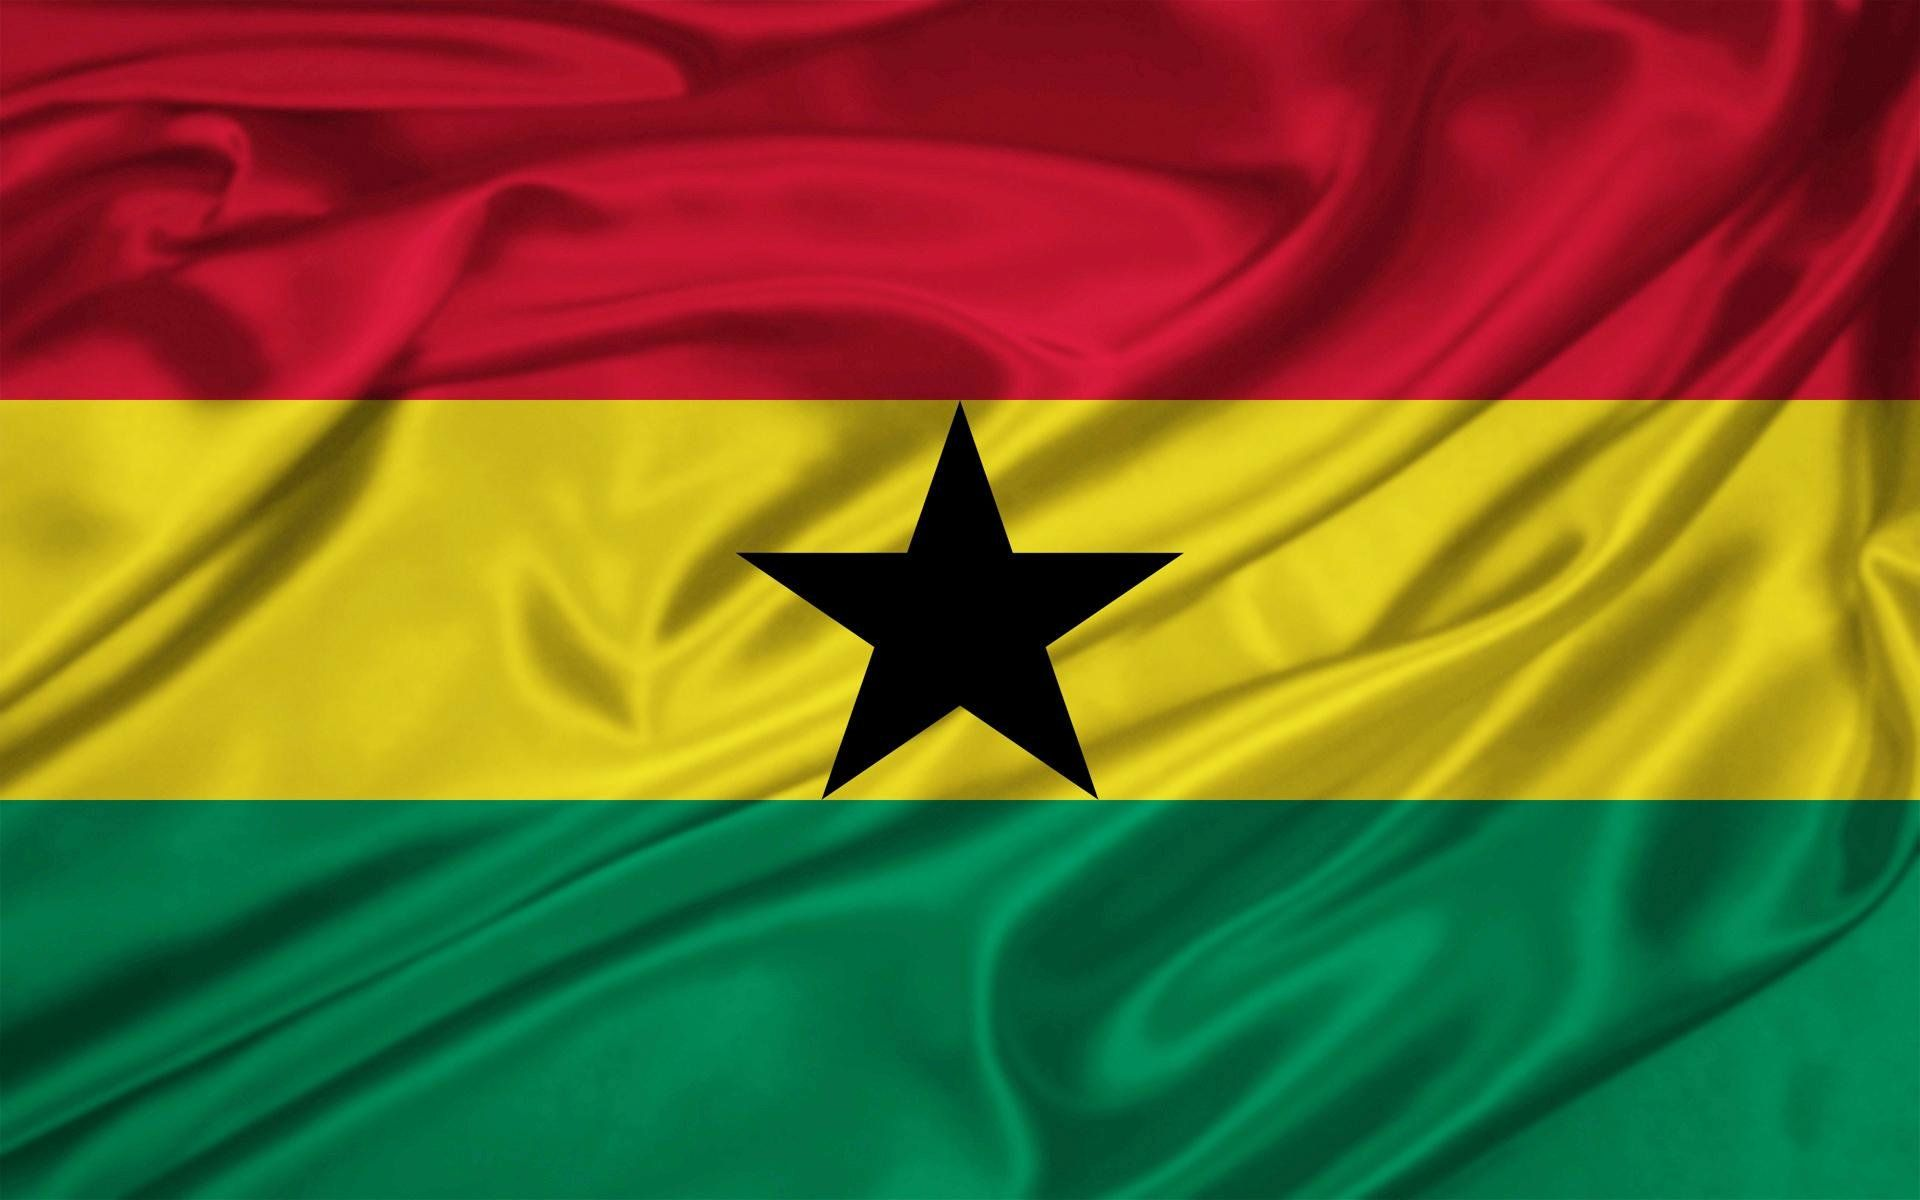 Ghana Flag Wallpapers Android Apps on Google Play Ghana